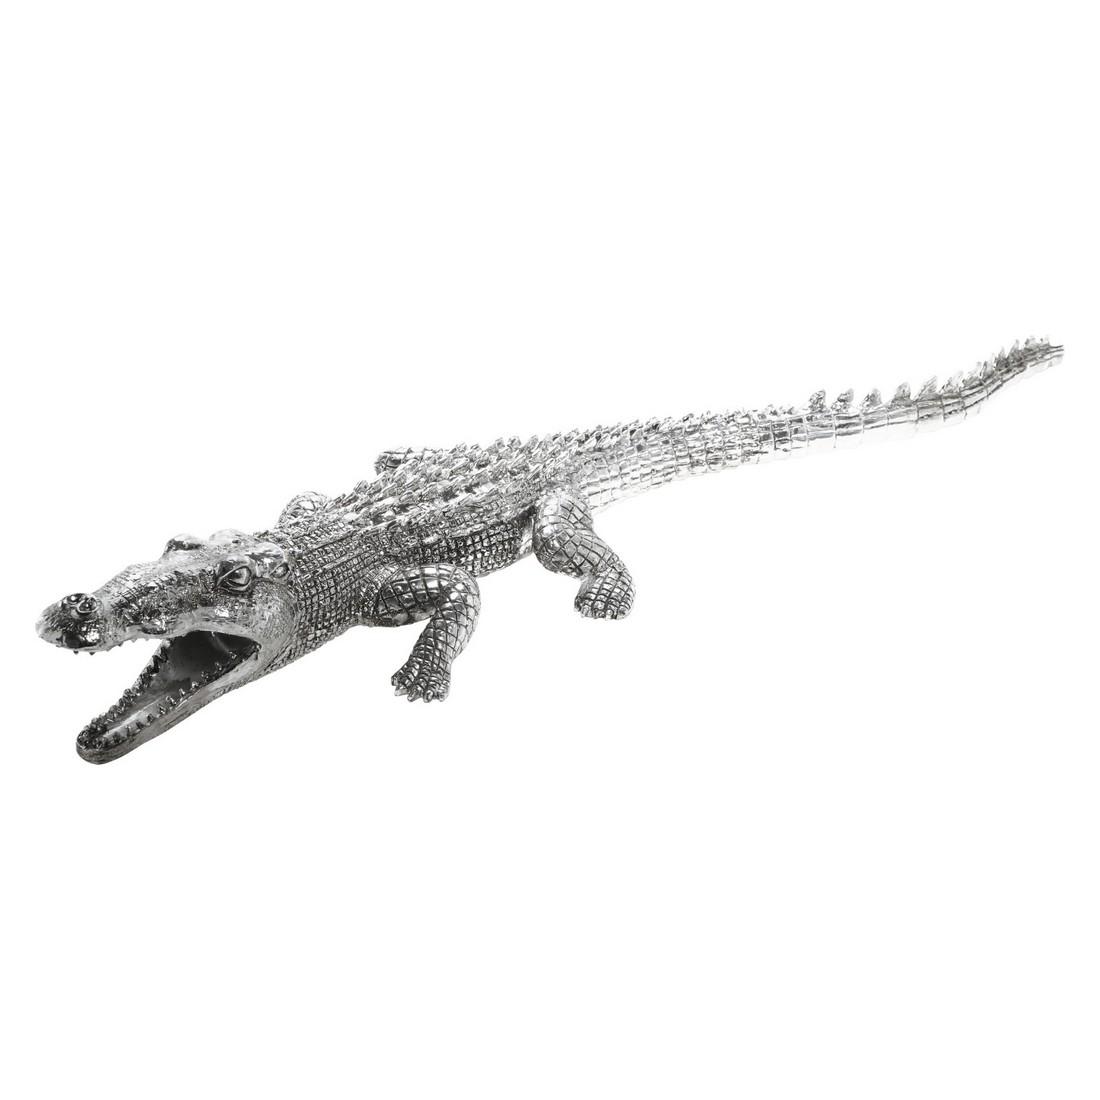 Deko Figur Krokodil Silver Big – Polyresin Grau, Kare Design kaufen